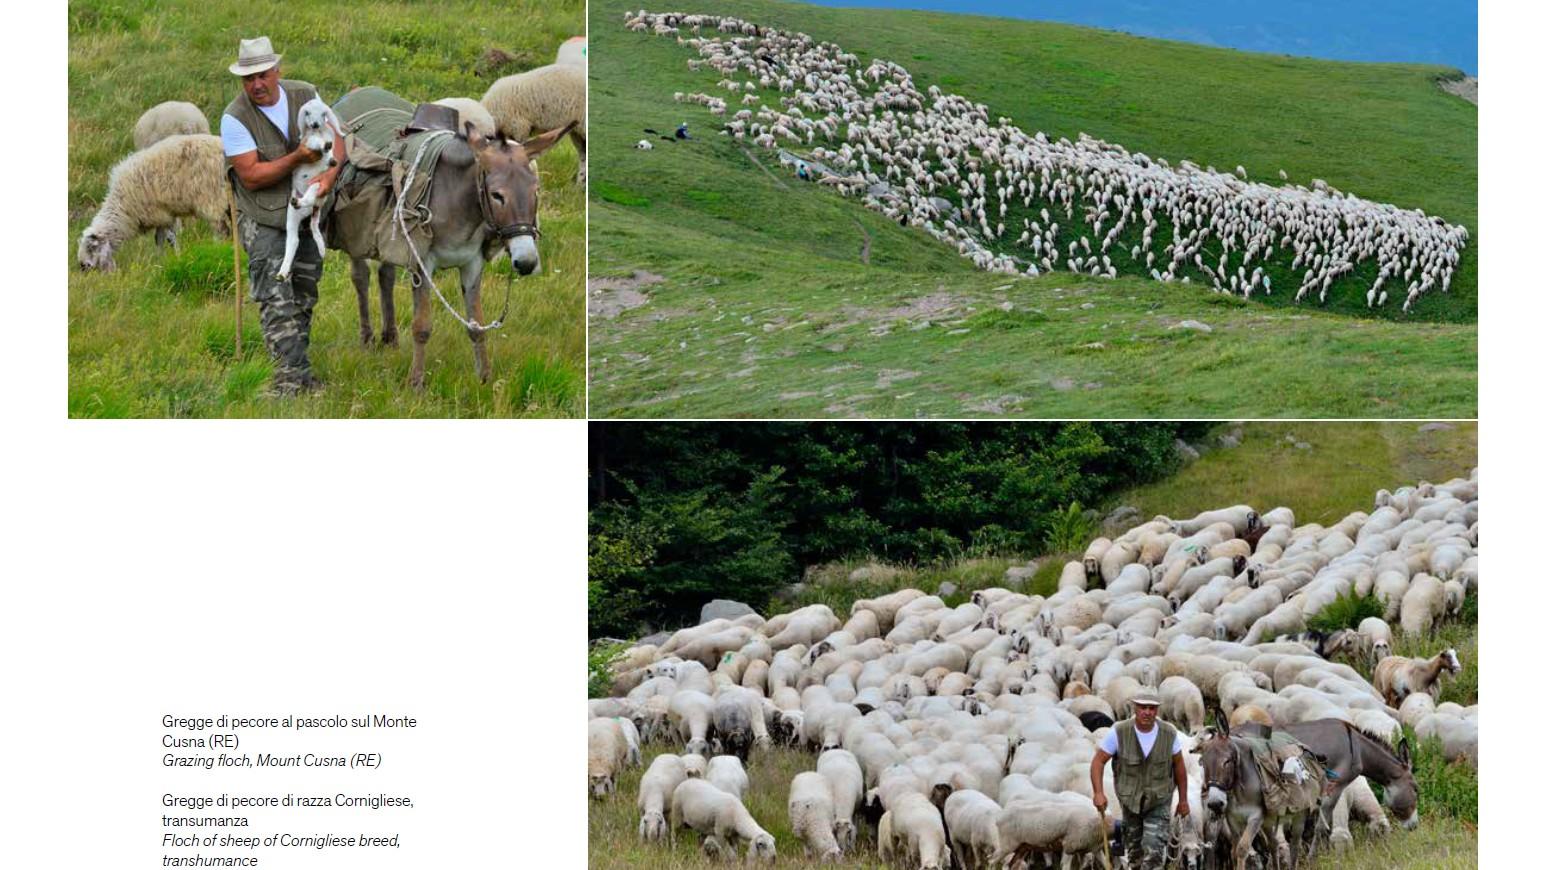 https://www.lucianocremascoli.com/fotosito/wp-content/uploads/2020/07/16.jpg